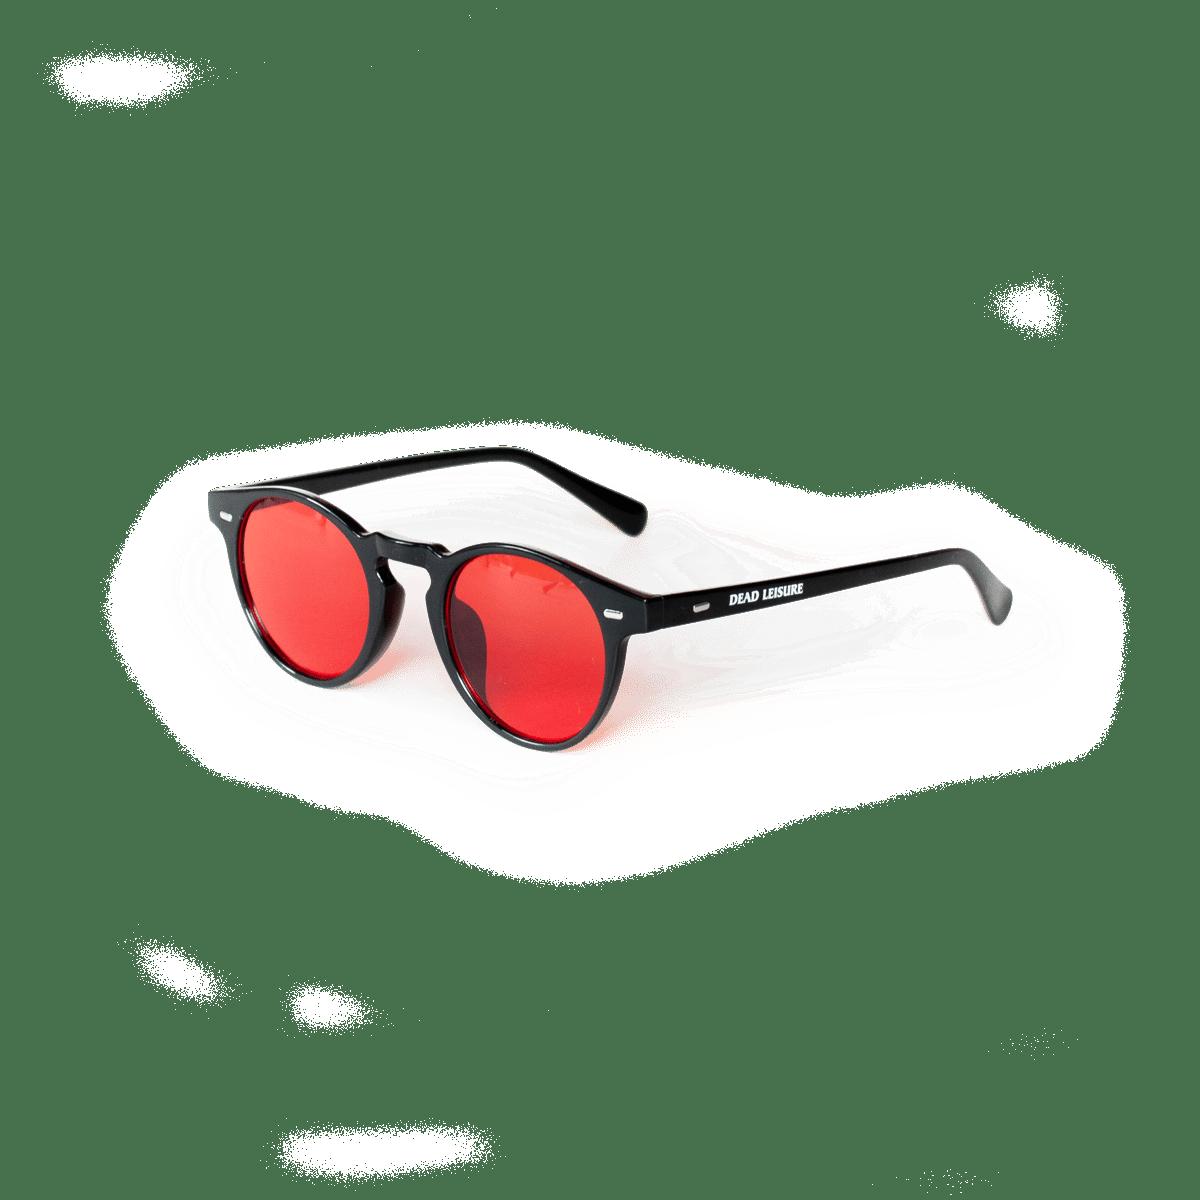 Interpreters Sunglasses - Red